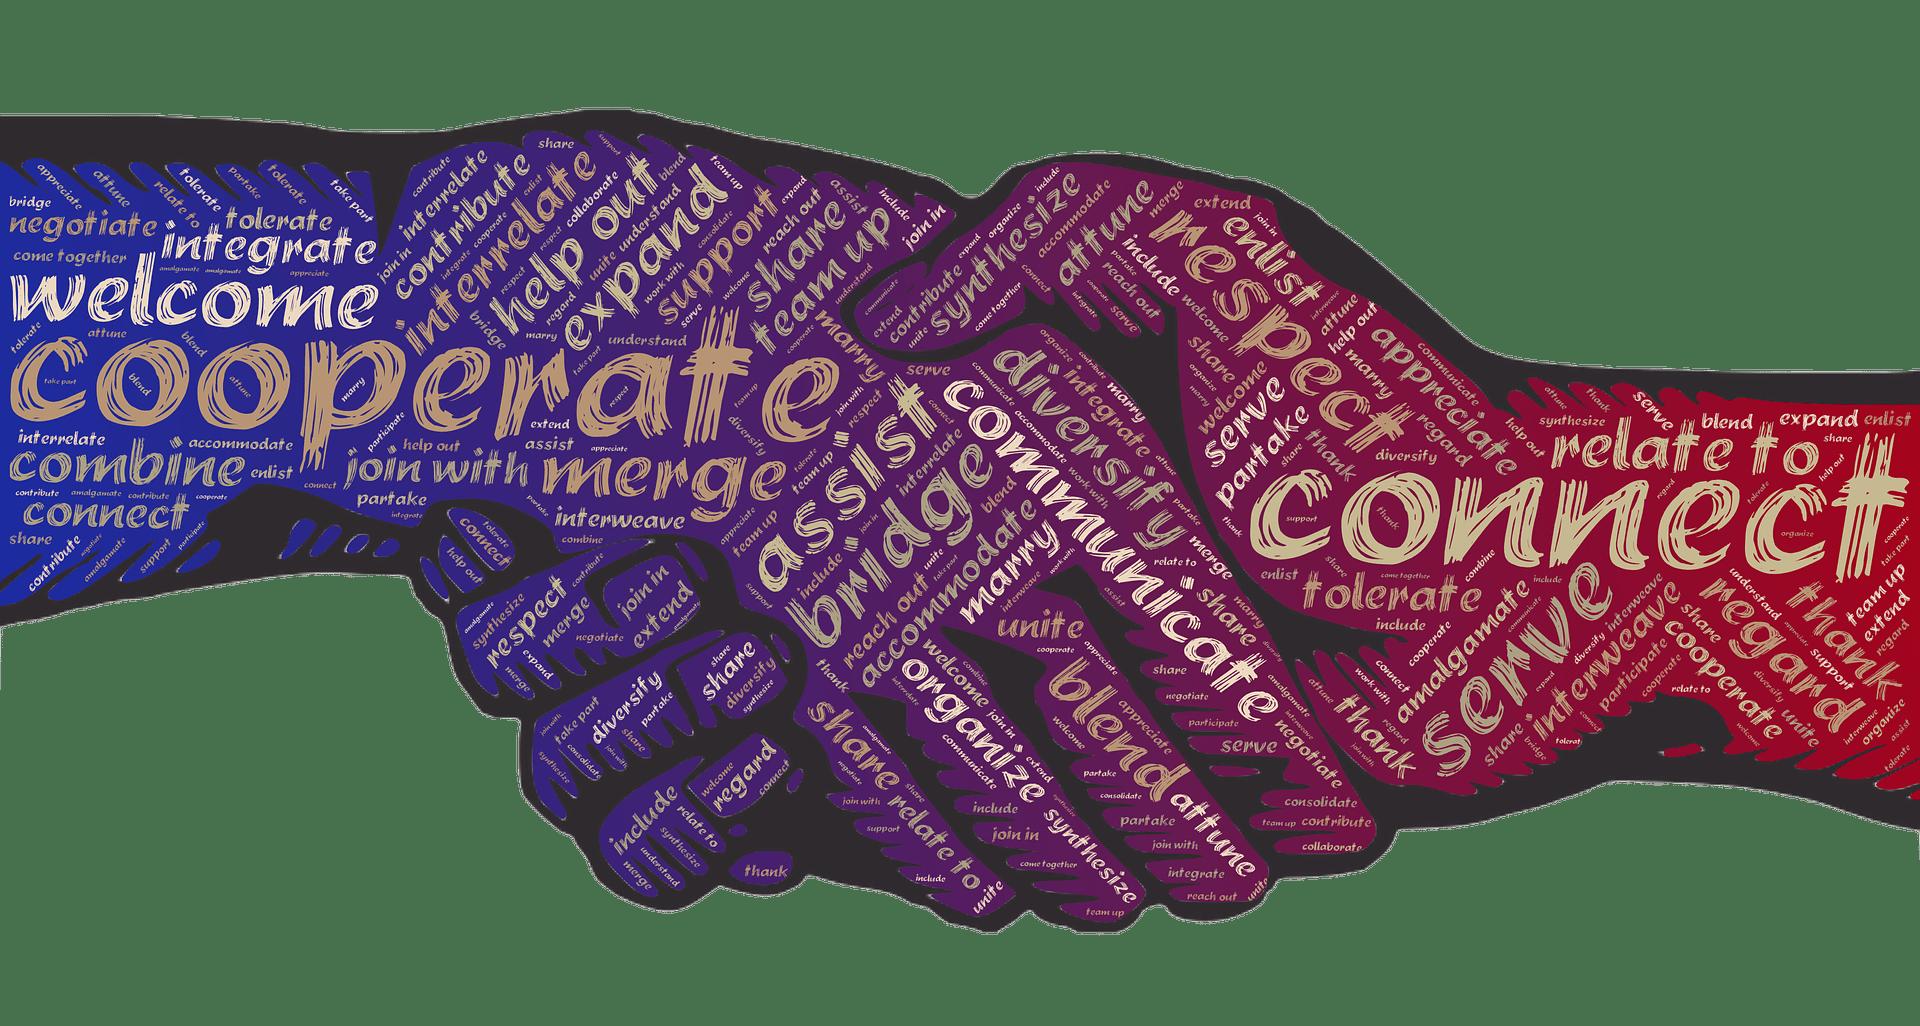 2021 Food Council Connection Calls